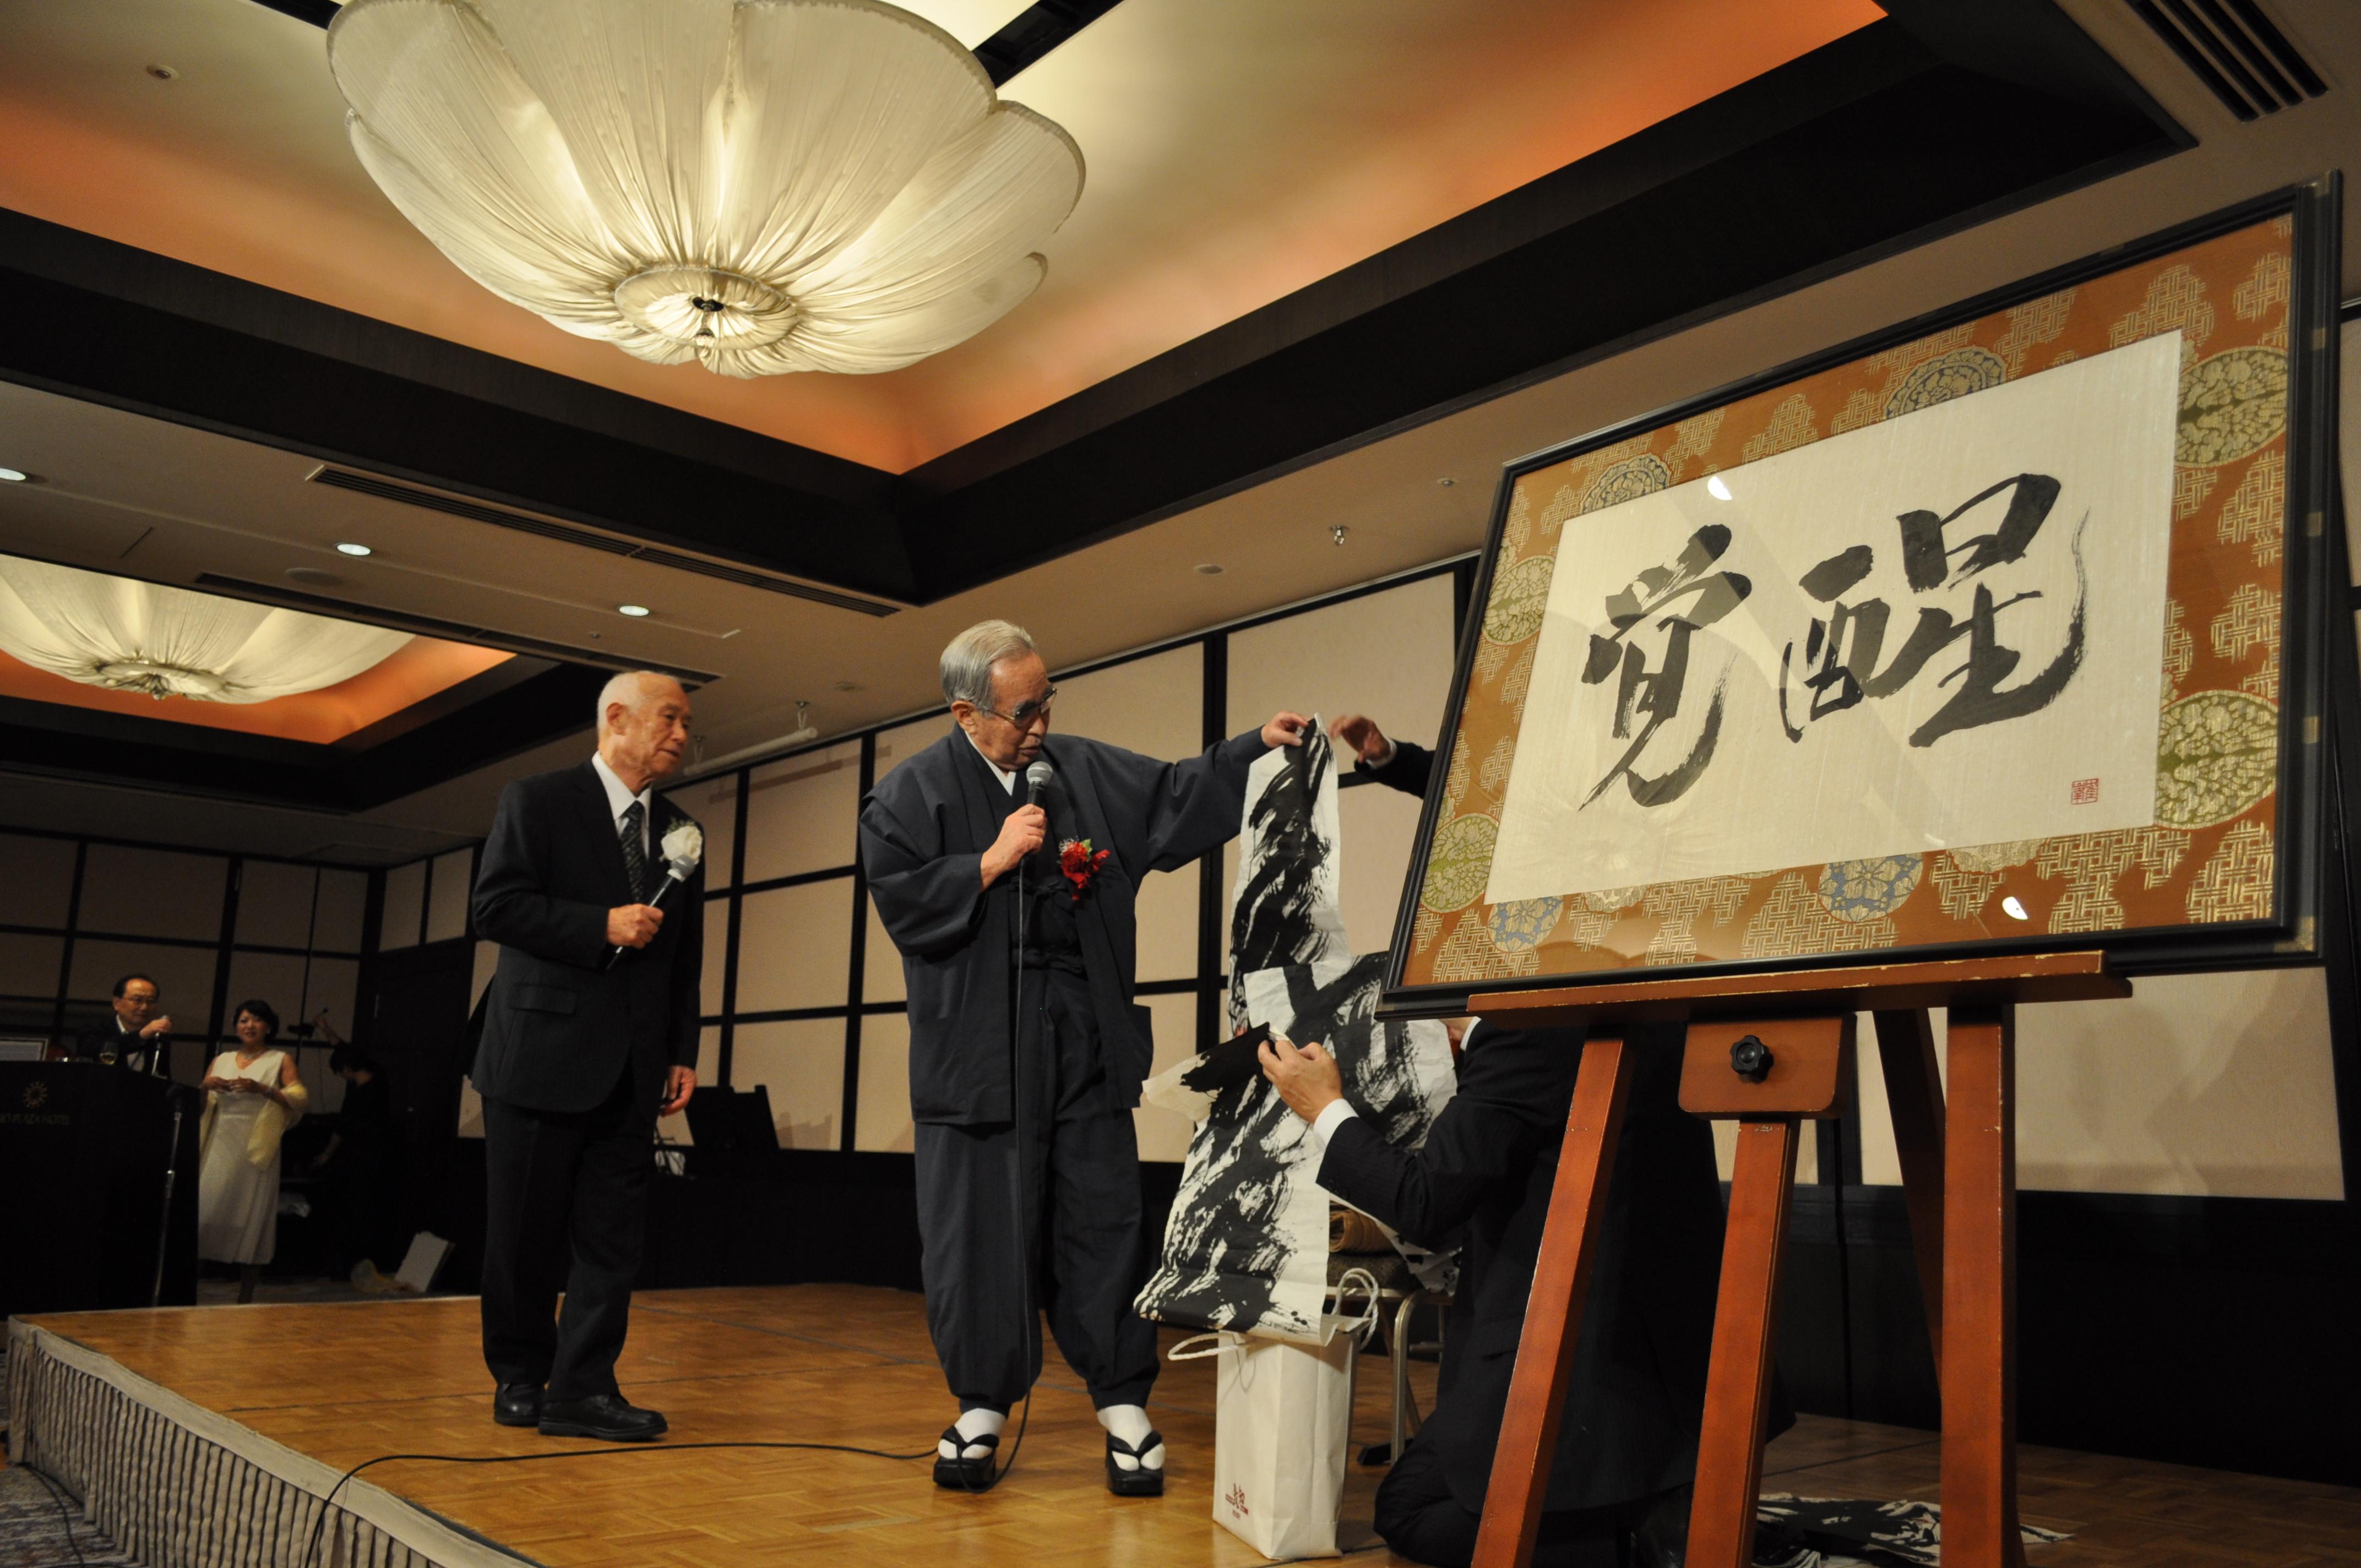 DSC 0542 - 第6回思風会全国大会2018in東京開催